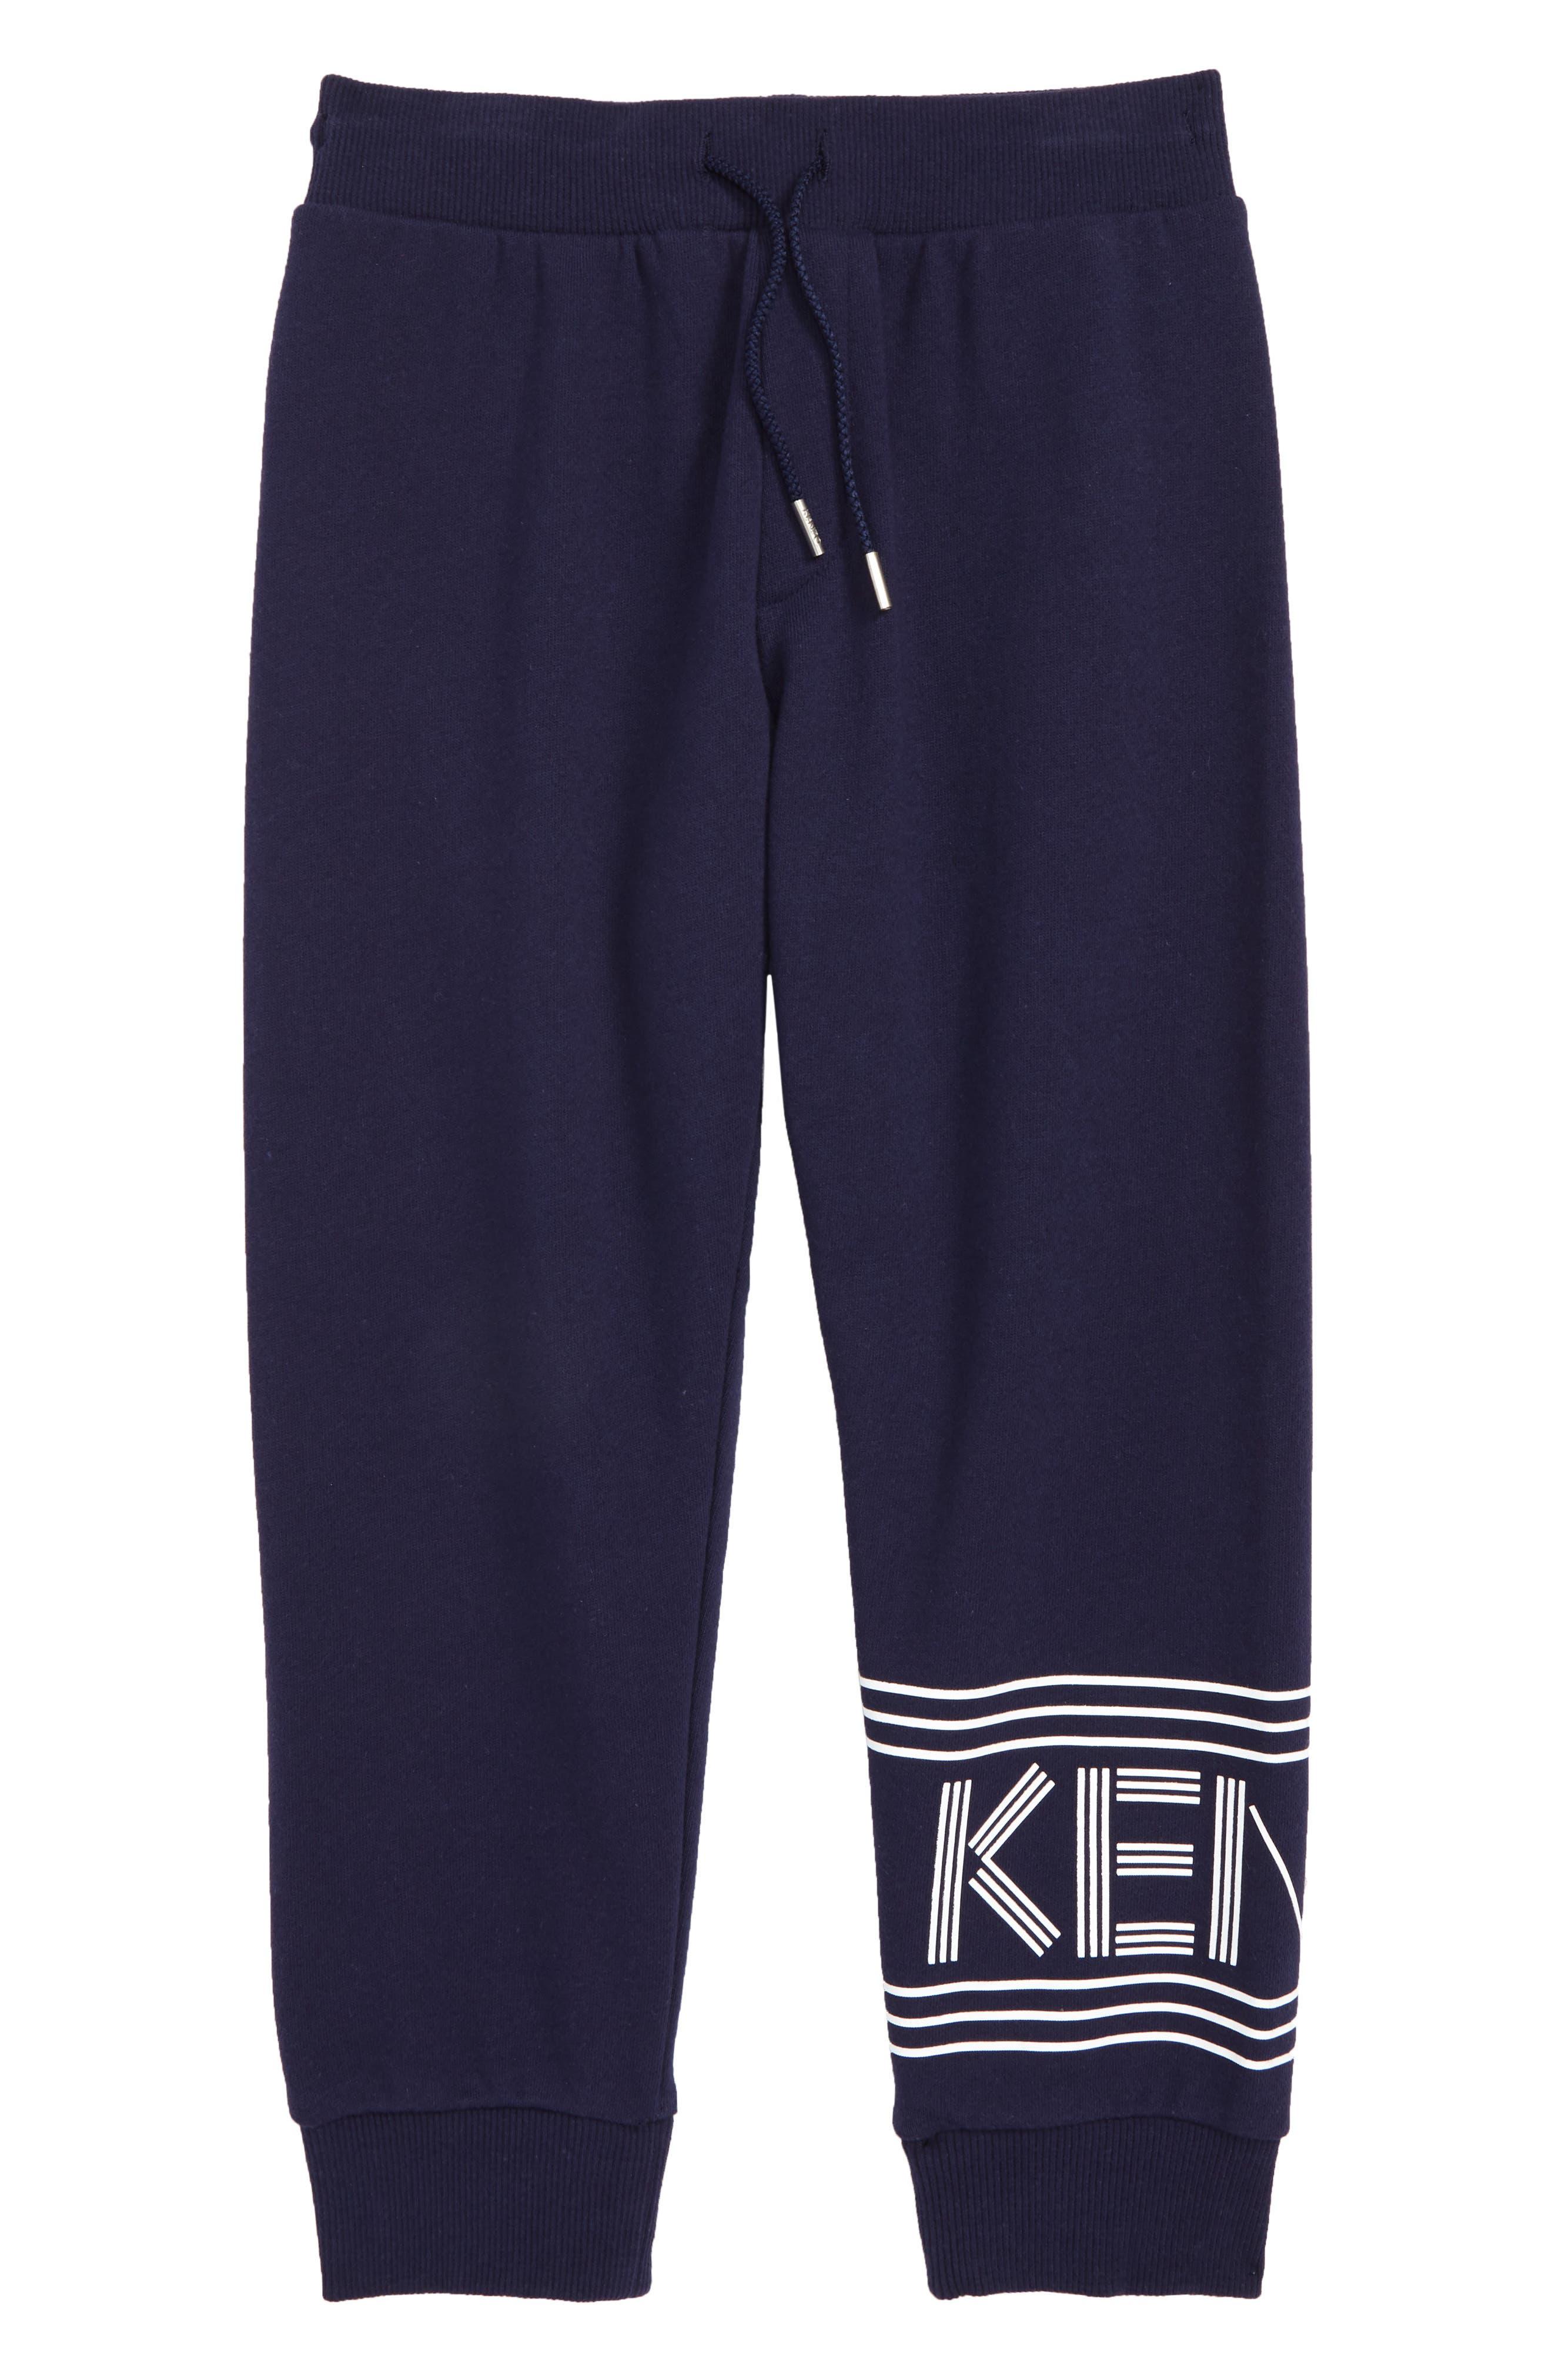 KENZO, Logo Jogger Sweatpants, Main thumbnail 1, color, NAVY